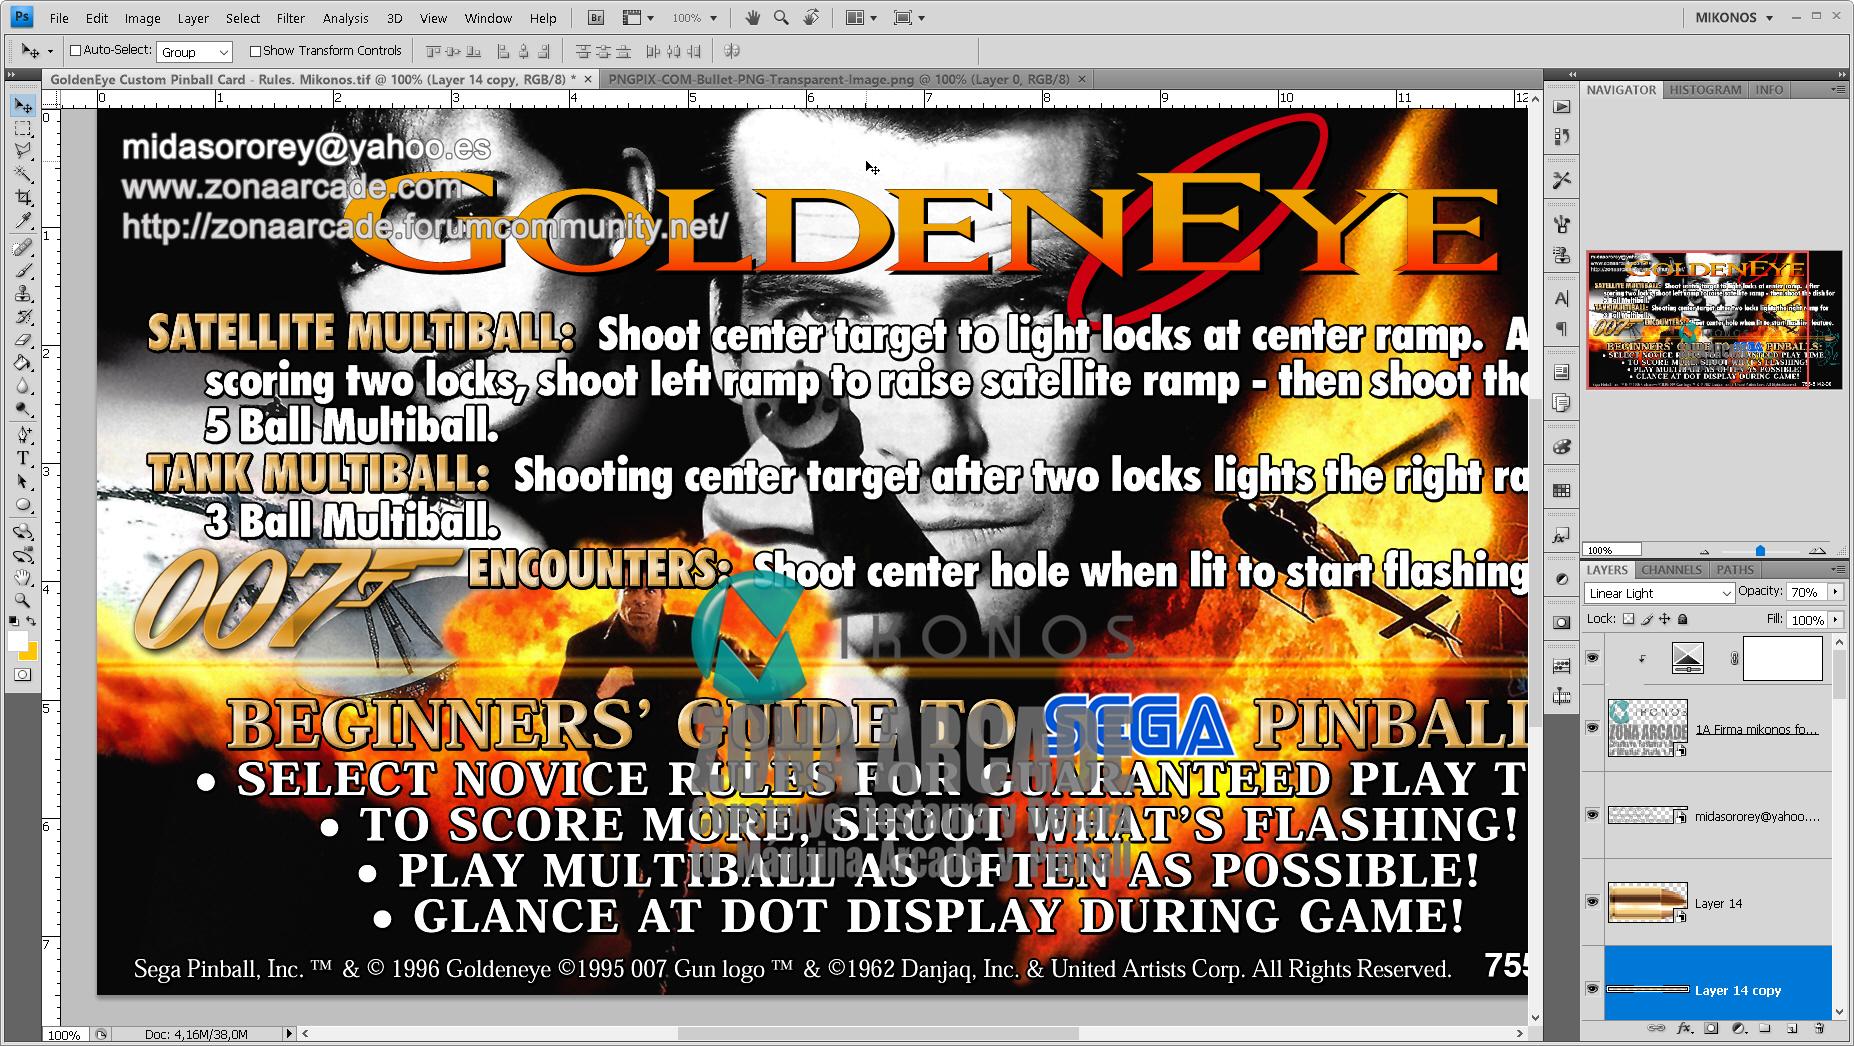 GoldenEye%20Custom%20Pinball%20Card%20-%20Rules.%20Mikonos2.jpg